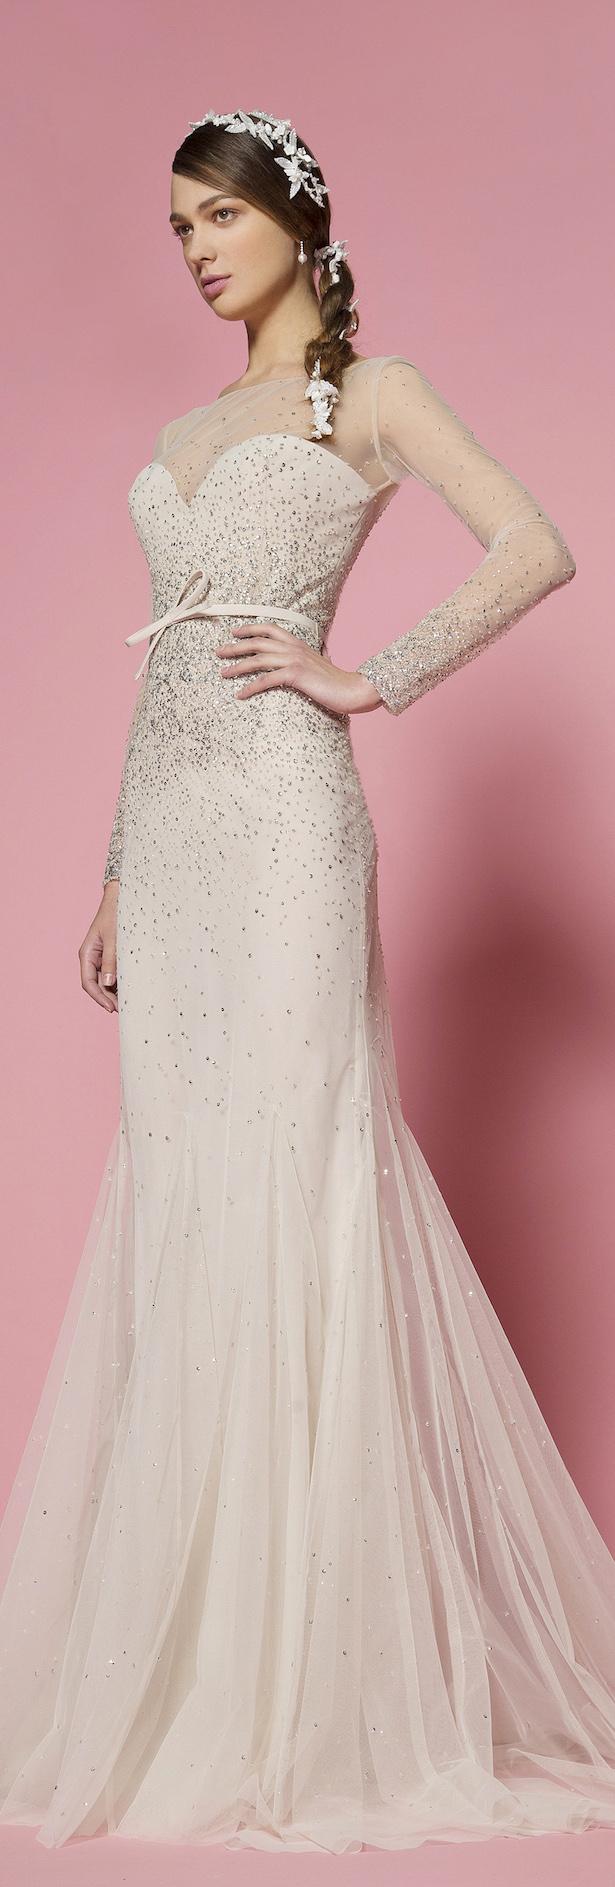 Pin de Bria Wade en My Favorite Wedding Gowns | Pinterest